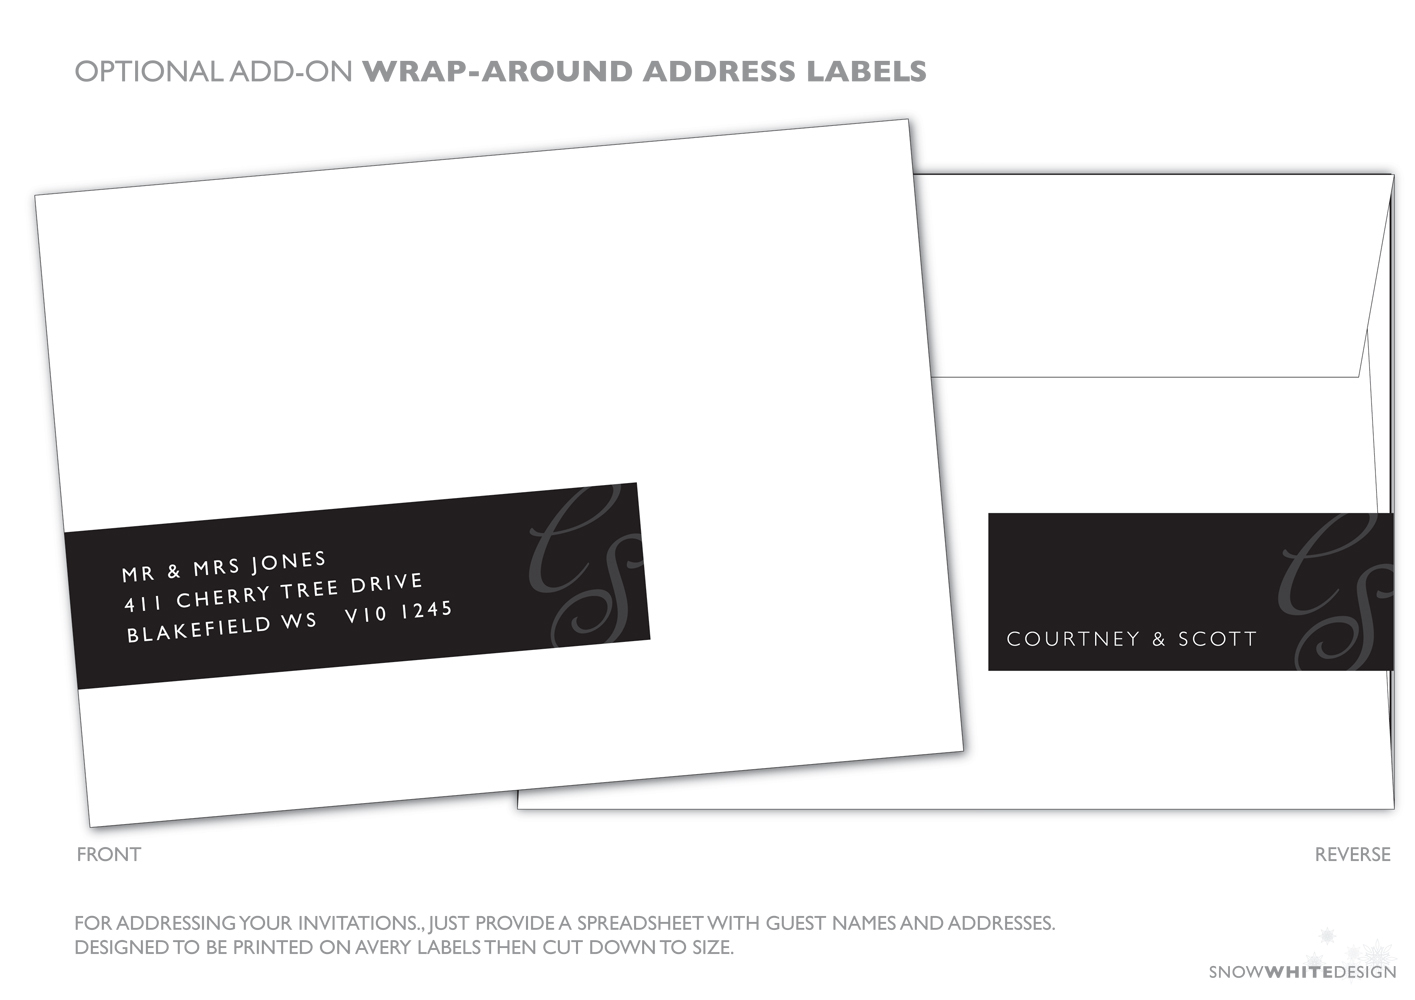 DIY, Stationery, white, black, invitation, Invitations, Grey, Design, Envelope, Invite, Snow, Address, Snow white design